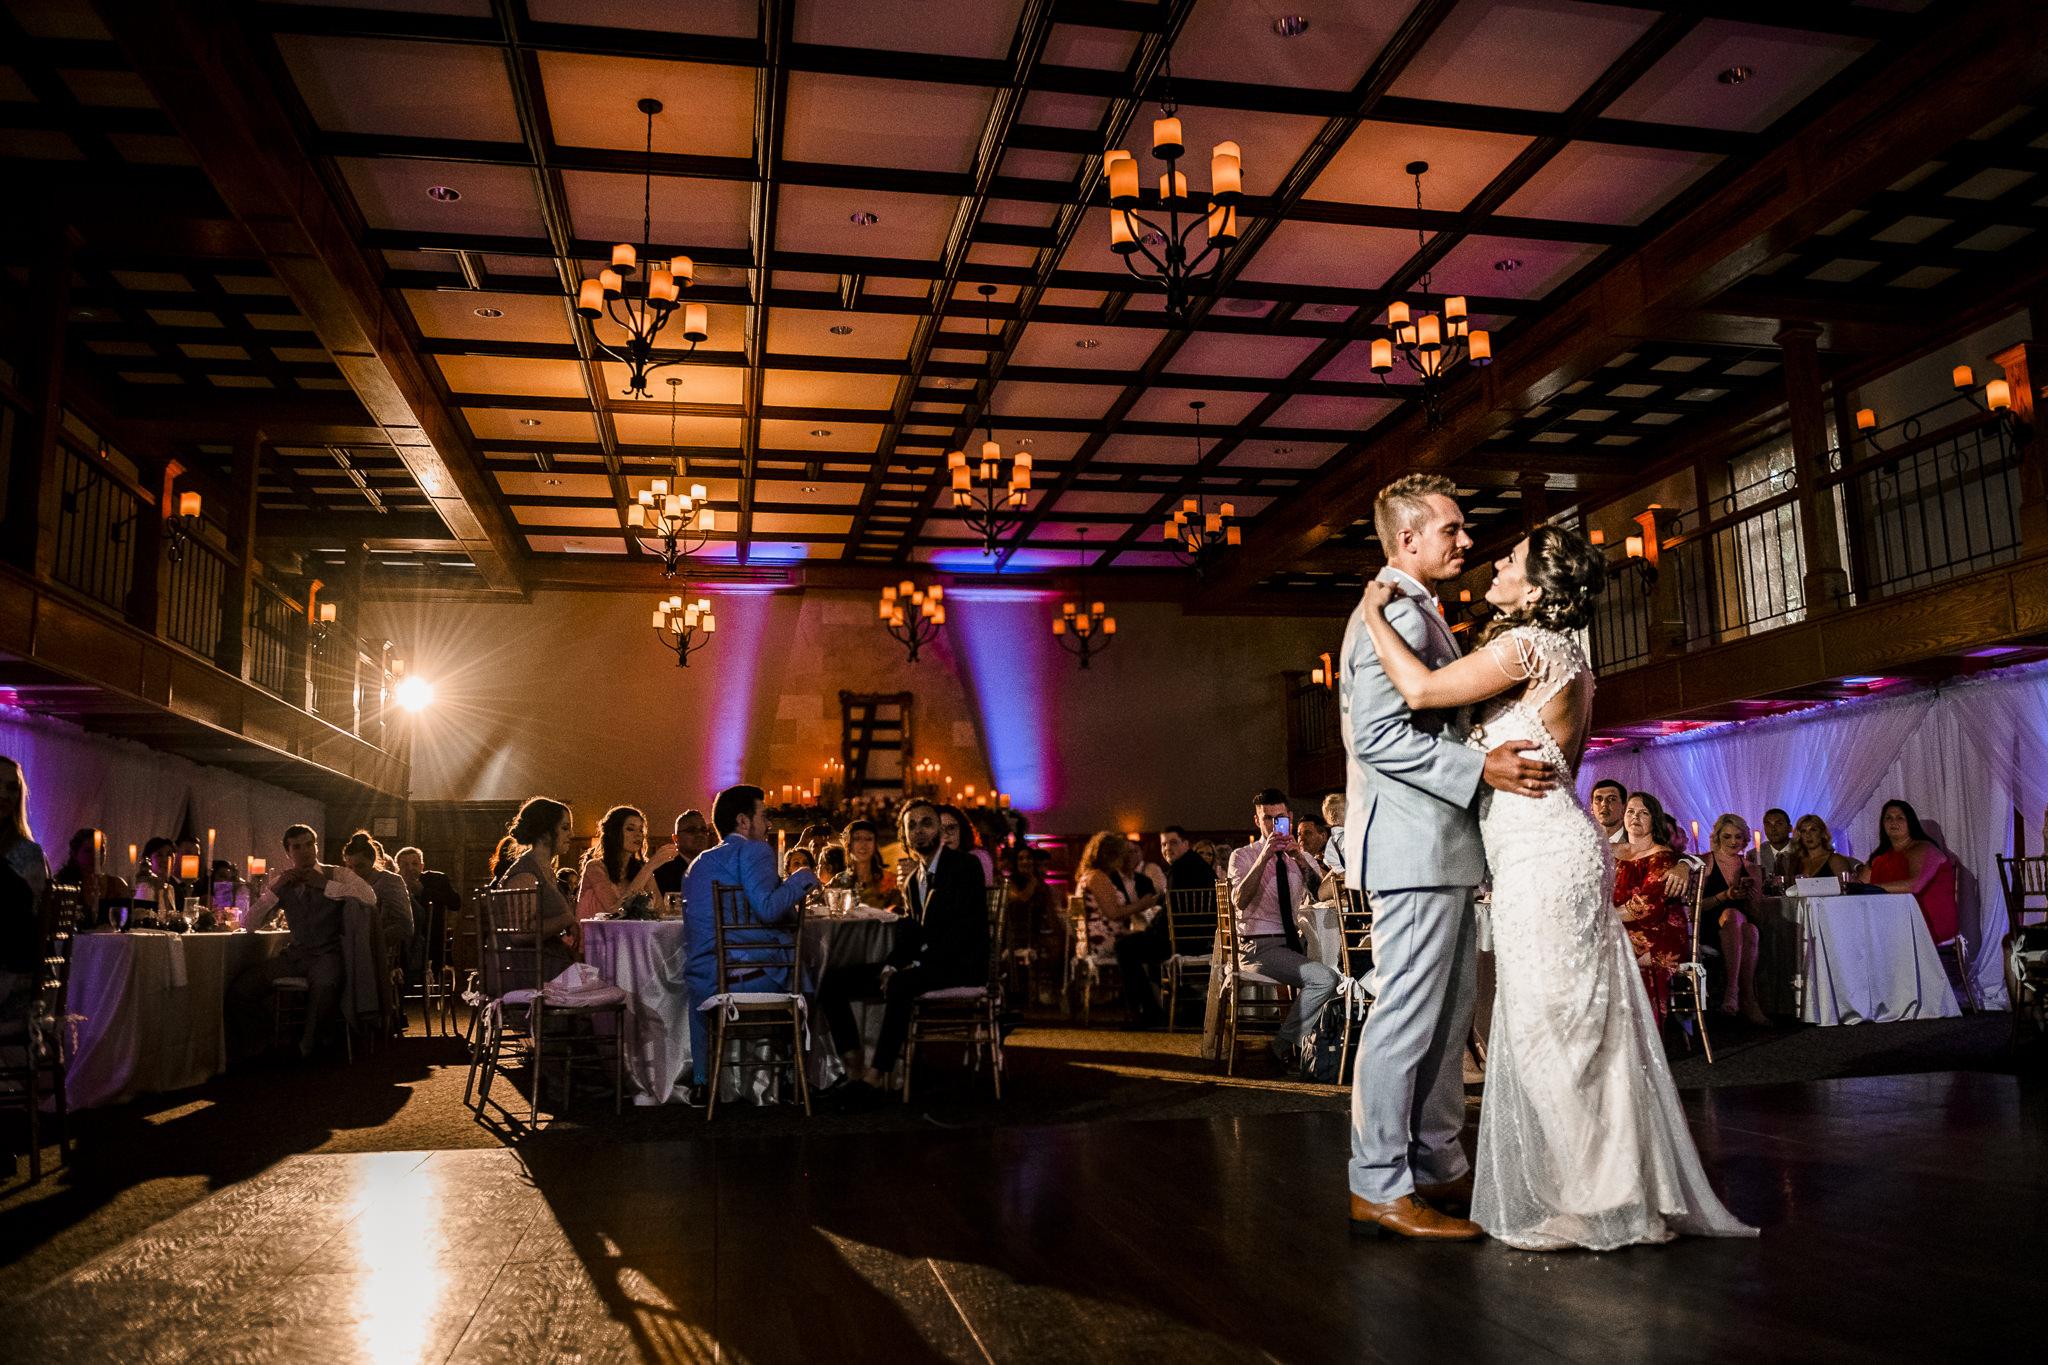 Barbato-Moorestown-Community-House-Wedding-New-Jersey-Photographer-27.JPG